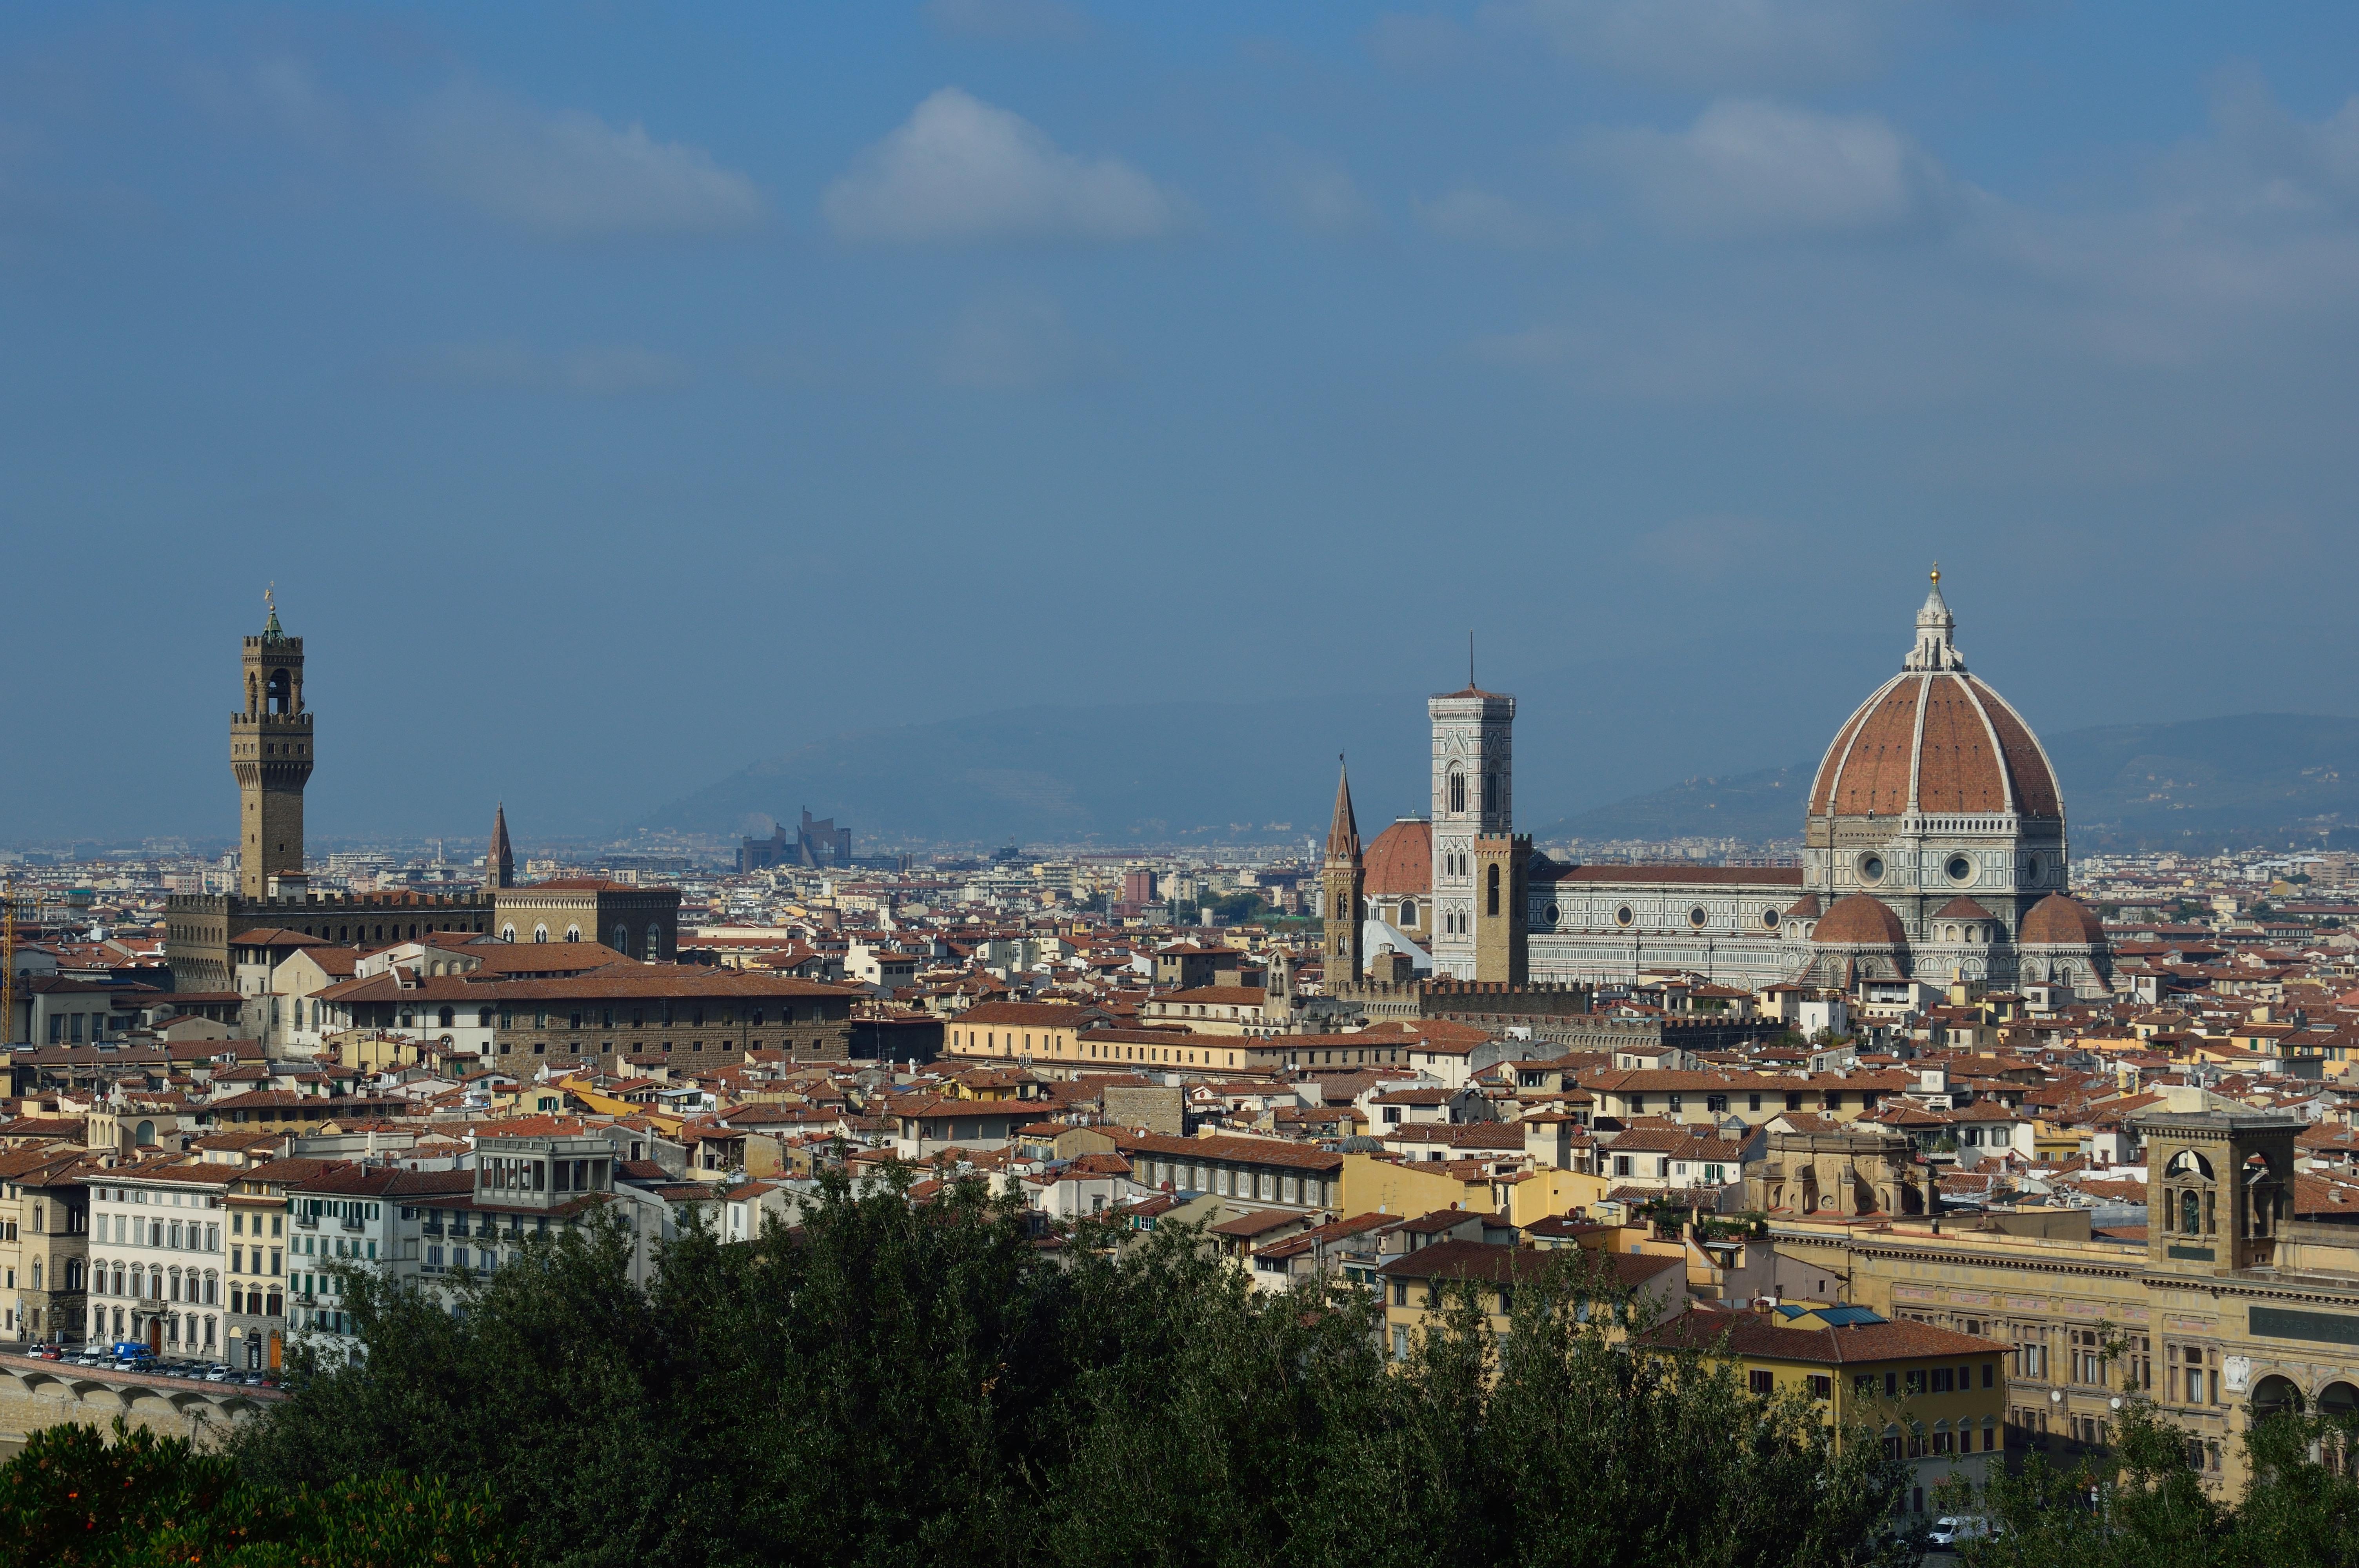 Firenze al mattino, vista da Piazzale MIchelangelo